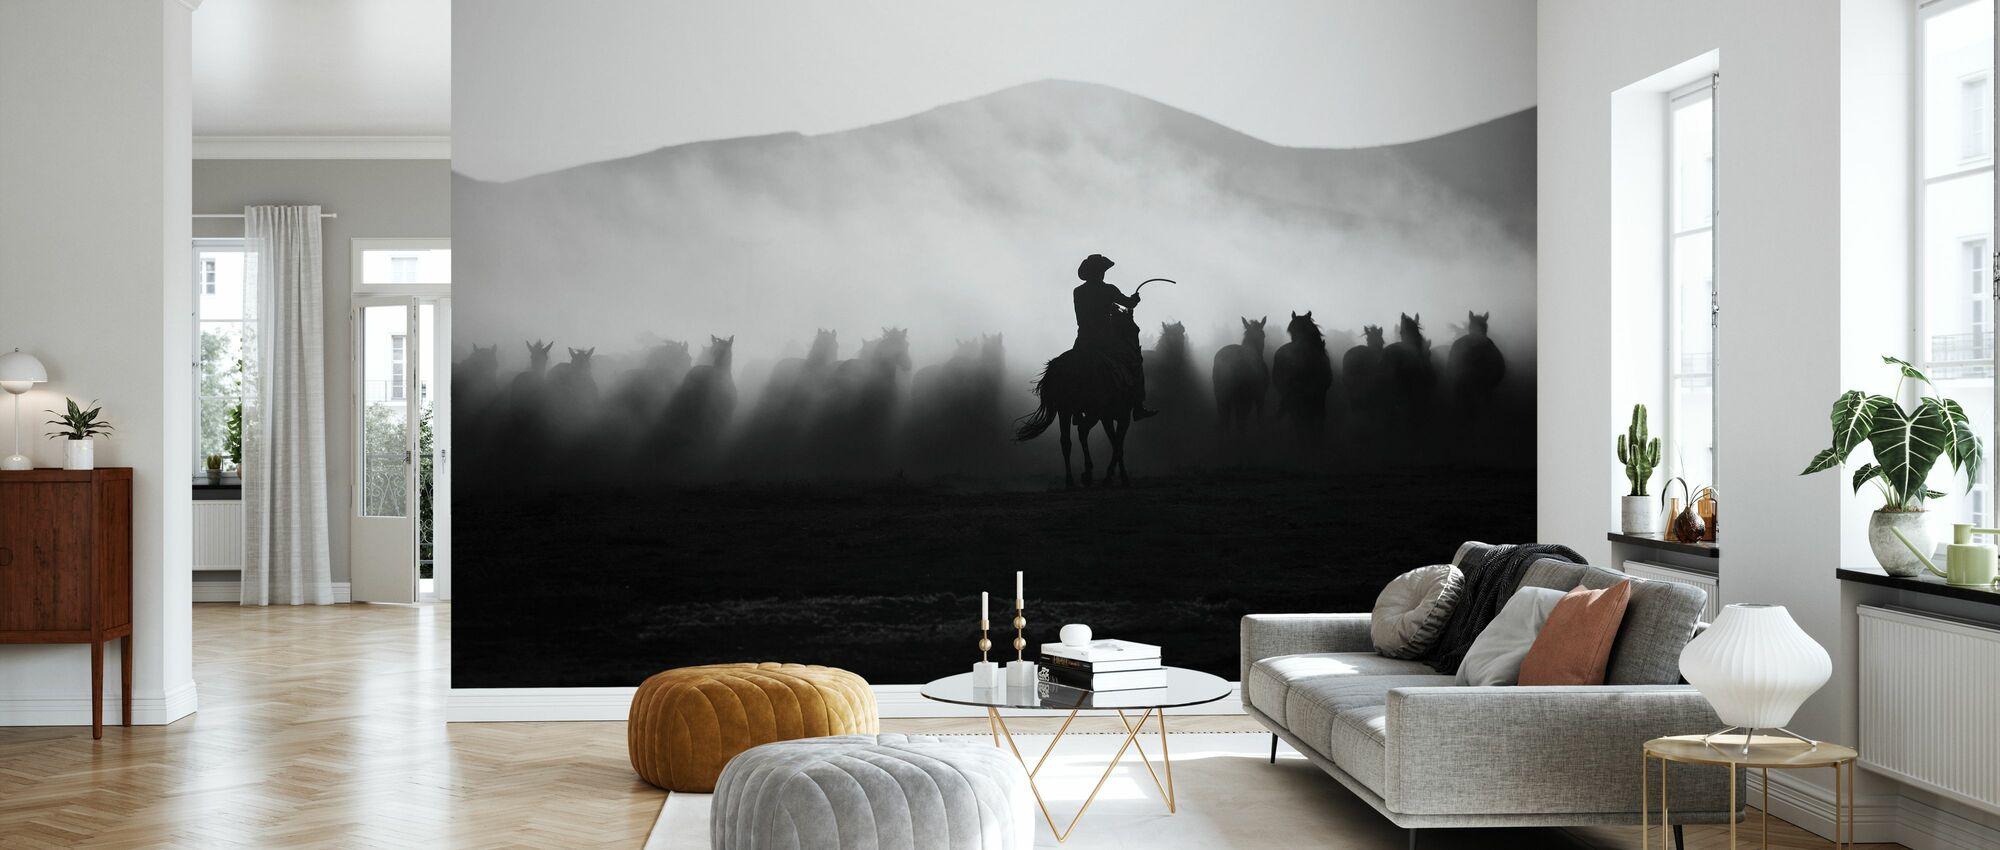 Chasing the Jades - Wallpaper - Living Room